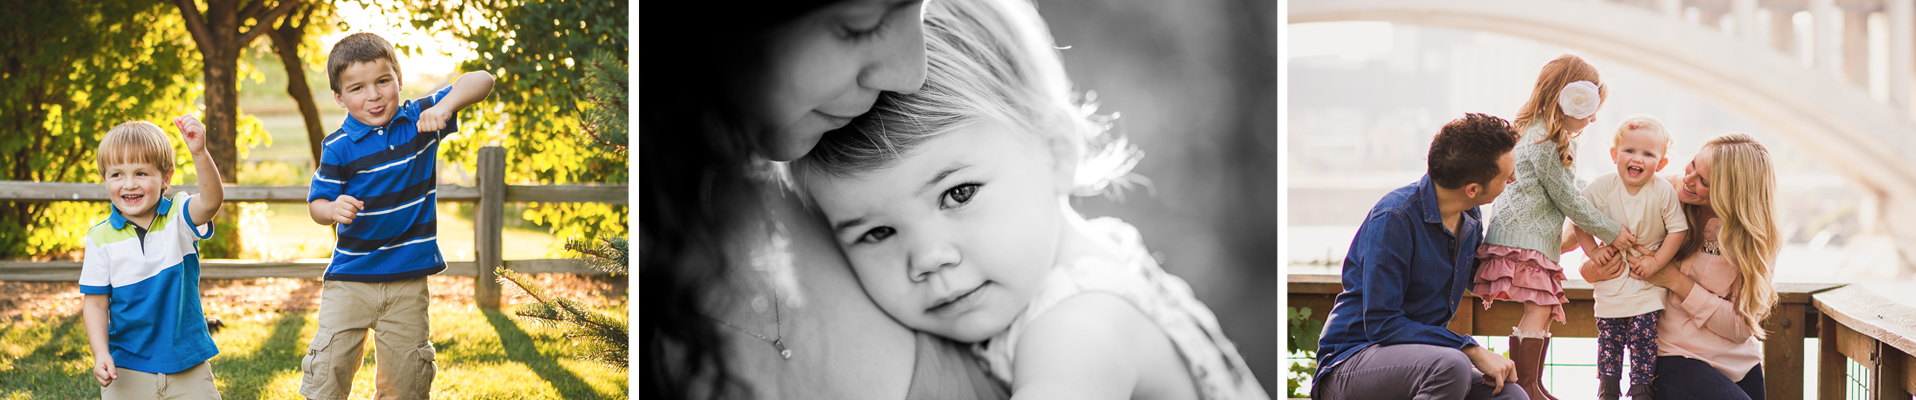 minnesota_family_portraits_stacidesign